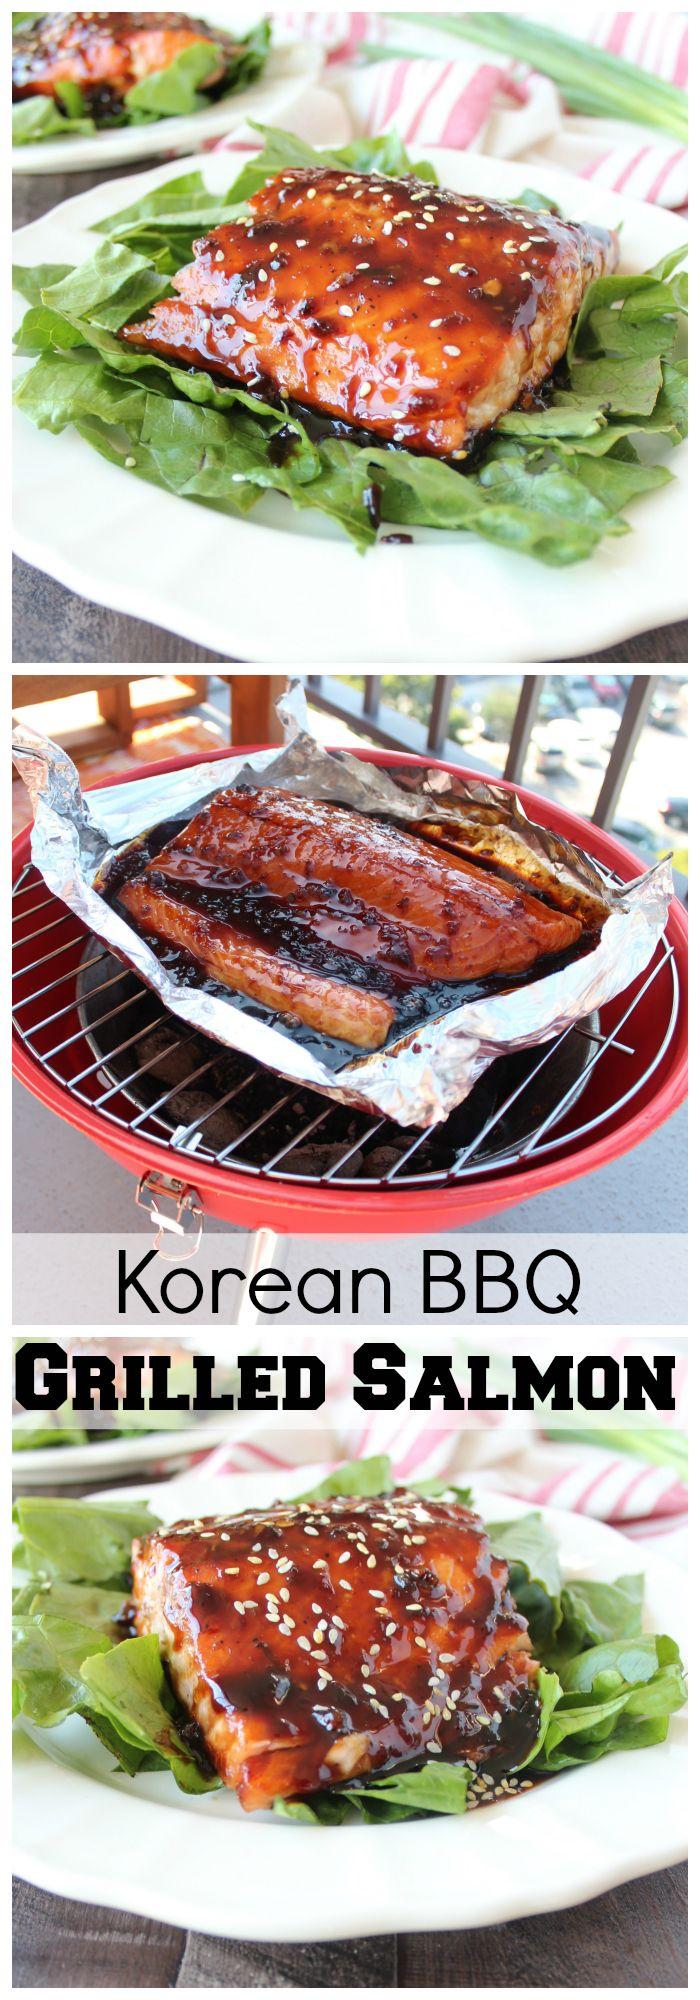 Homemade Korean BBQ sauce covered salmon recipe grilled on @worldmarket's new Mini BBQ!